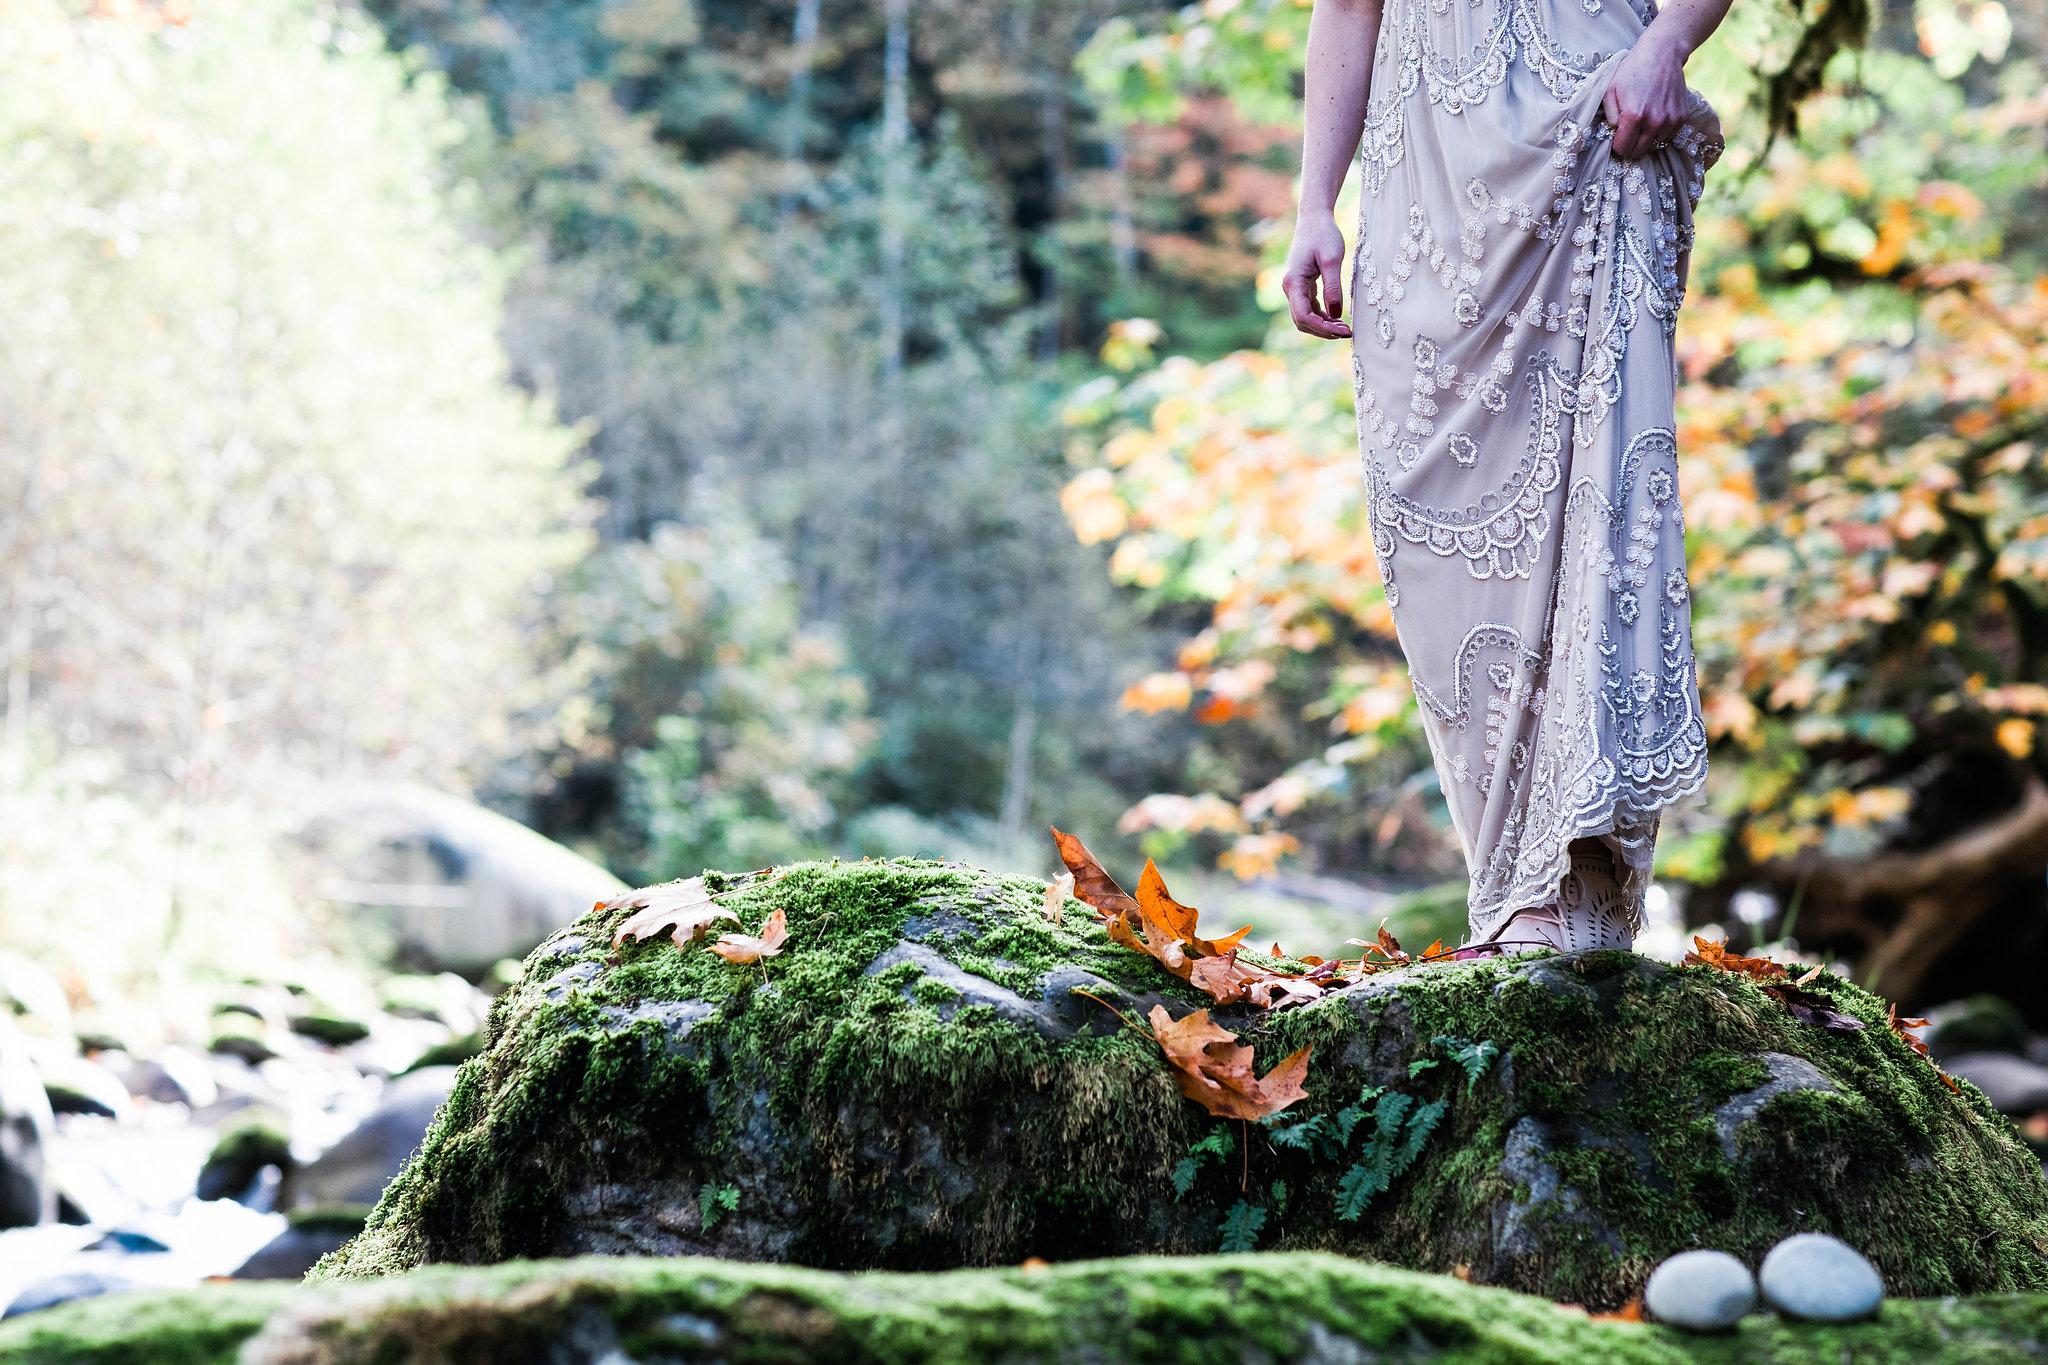 woodsy-treehouse-point-issaquah-elopement-Seattle-photographer-adina-preston-4.jpg